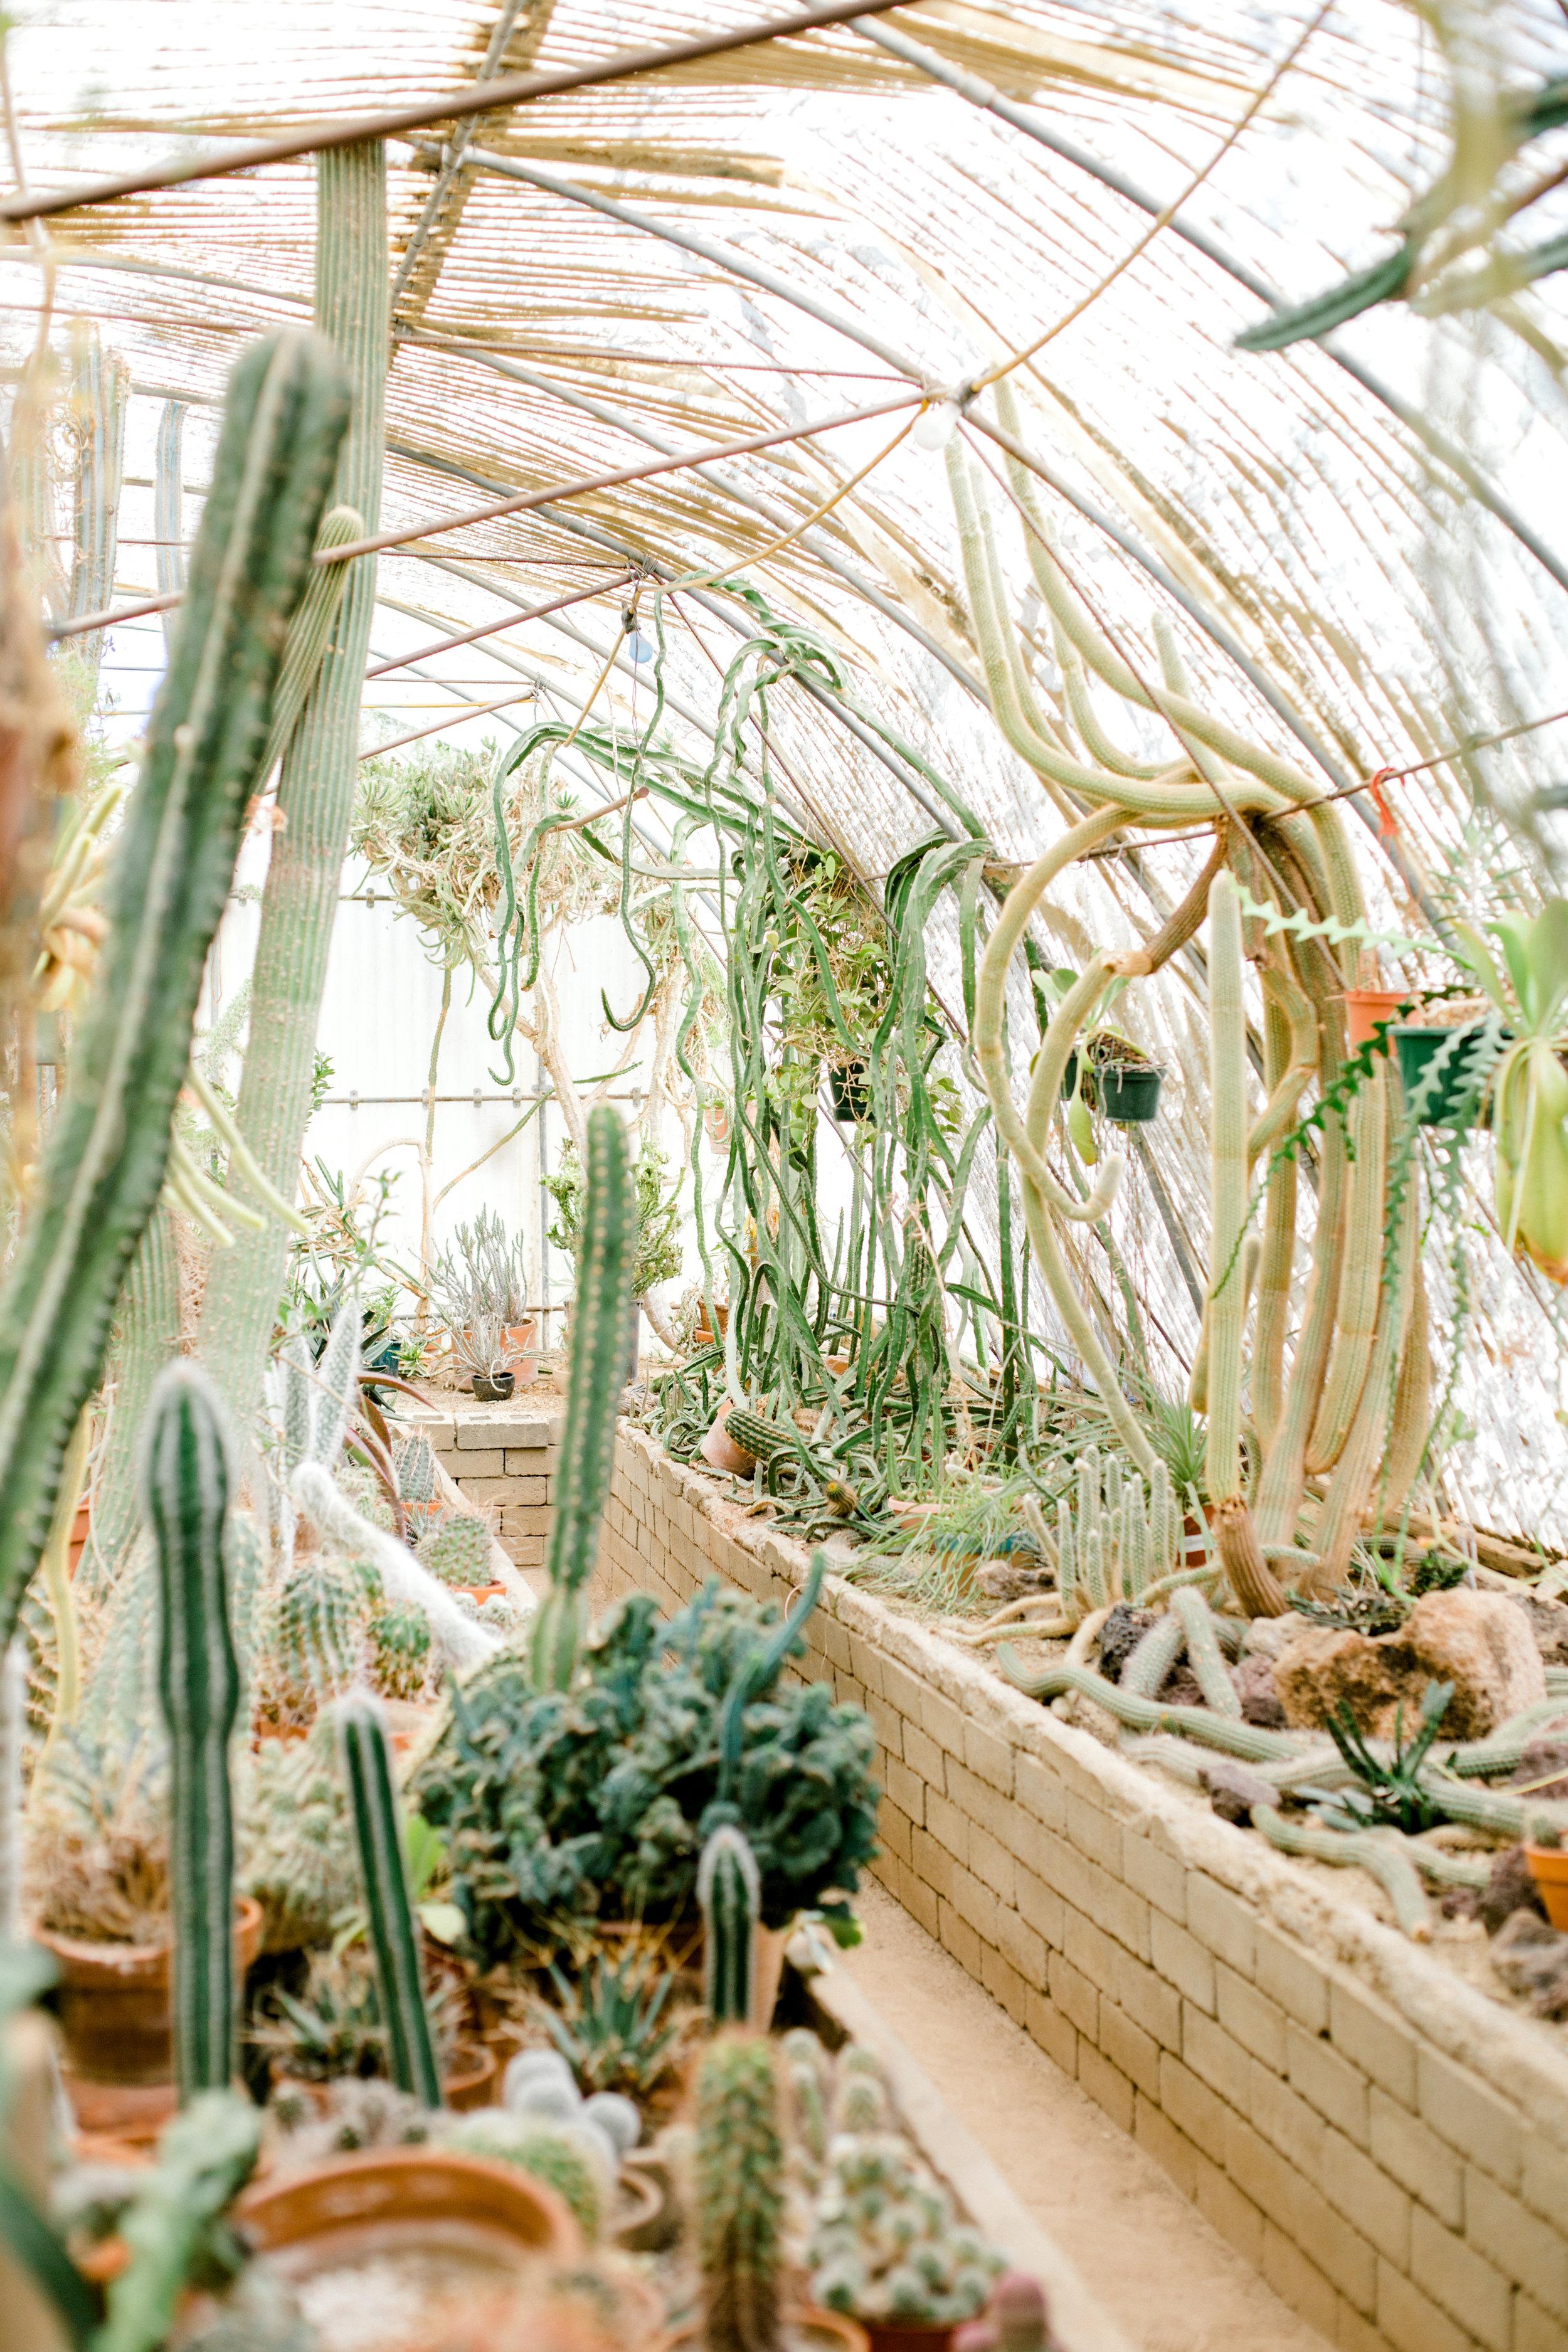 Jessica Sgubin Photography Atlanta Portrait photographer los angeles la salvation mountain greenhouse cactus garden moorten botanical garden cabazon dinosaurs santa monica joshua tree-56.jpg